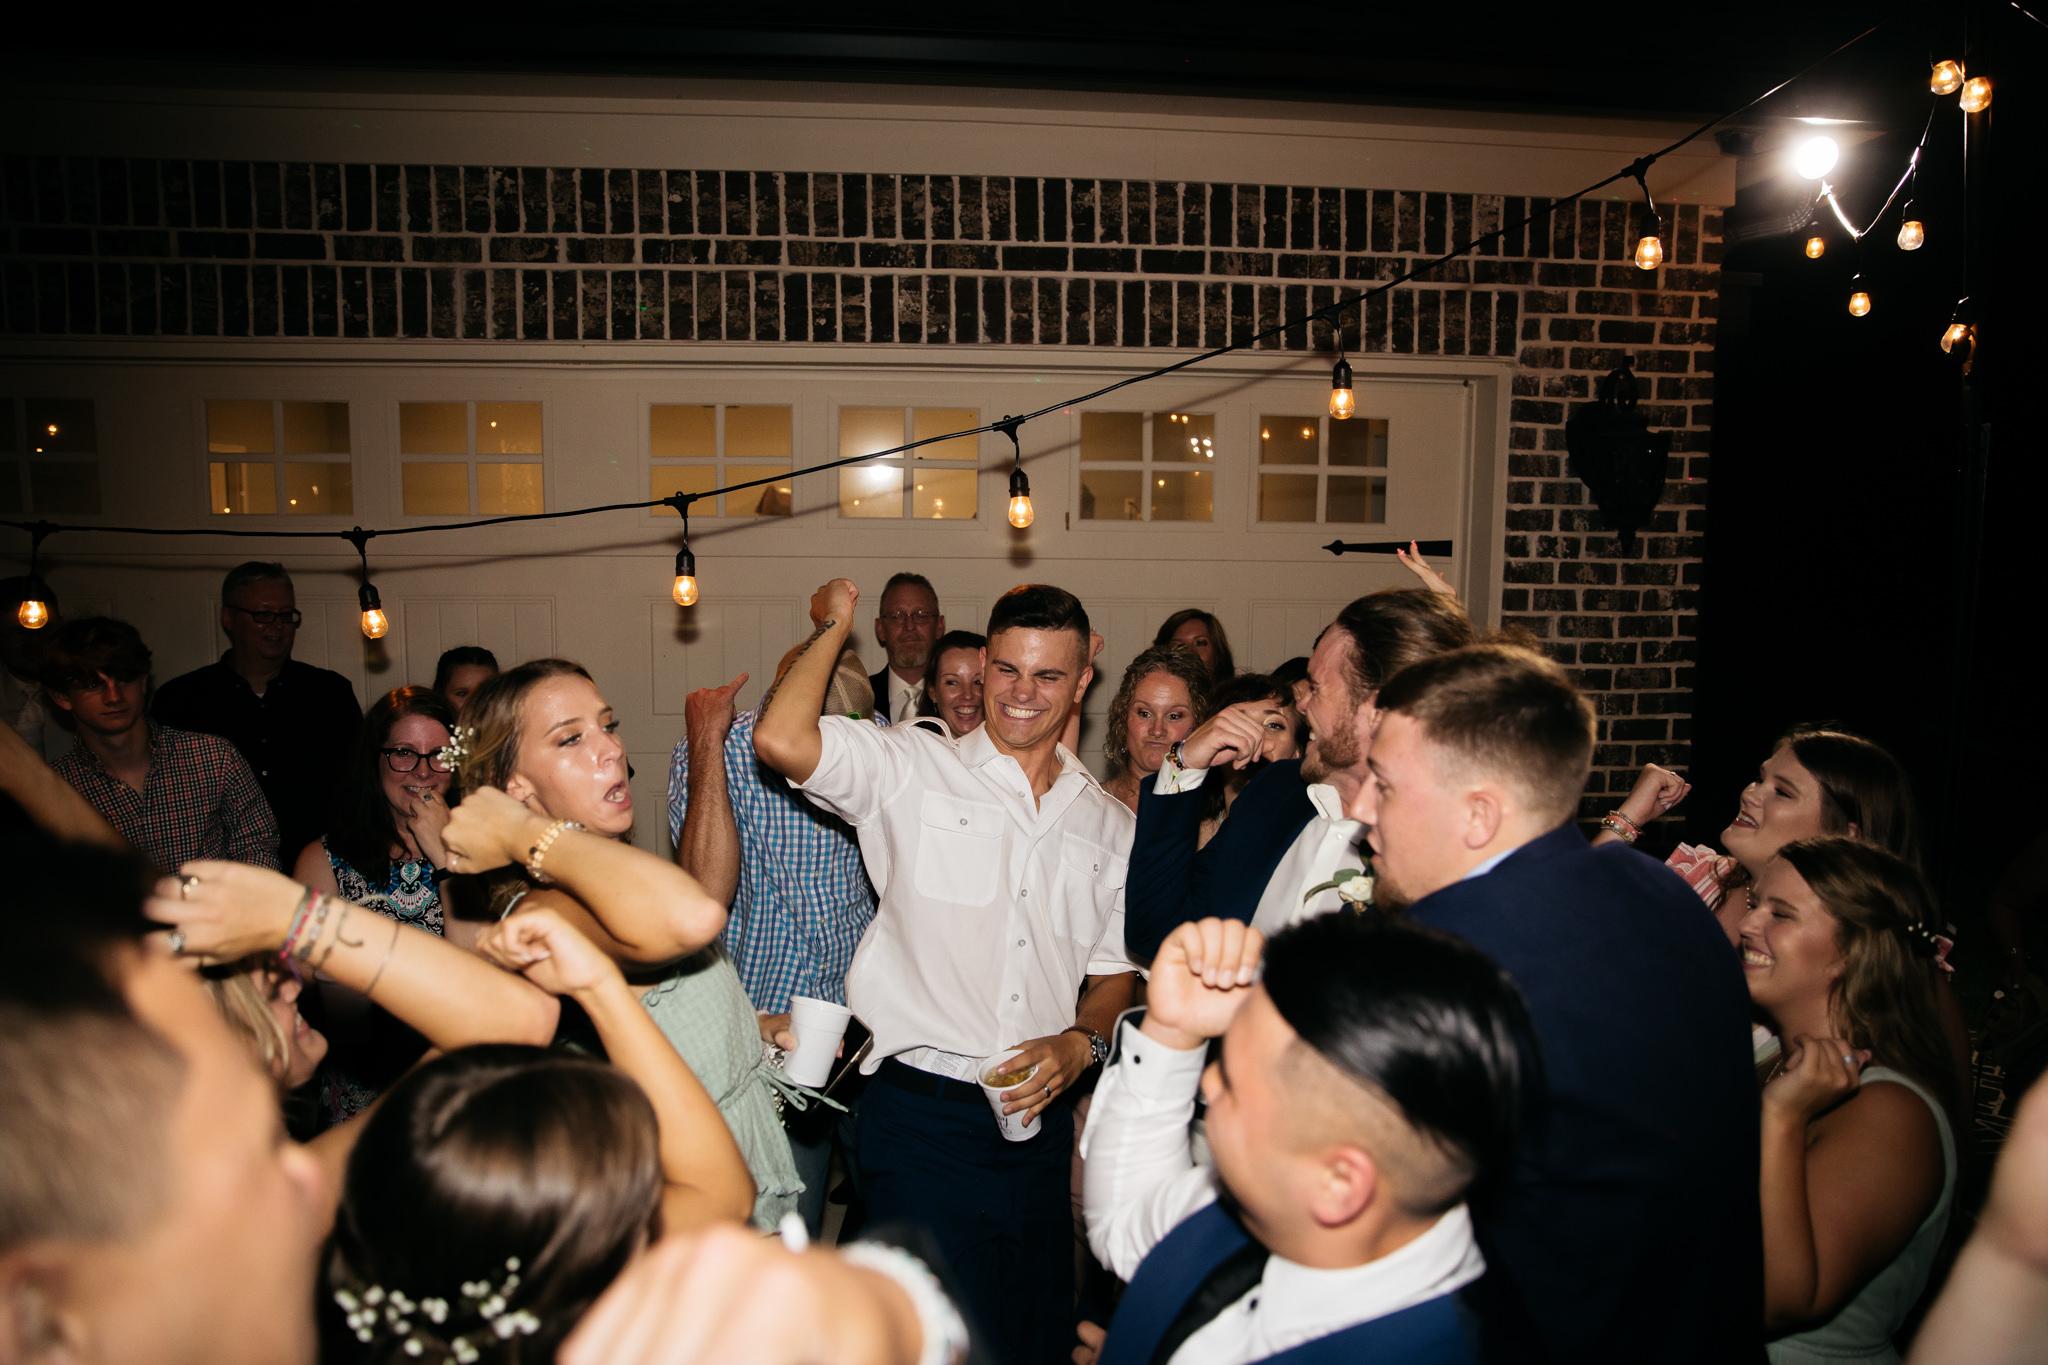 backyard-wedding-thewarmtharoundyou-lexy-branson-95.jpg